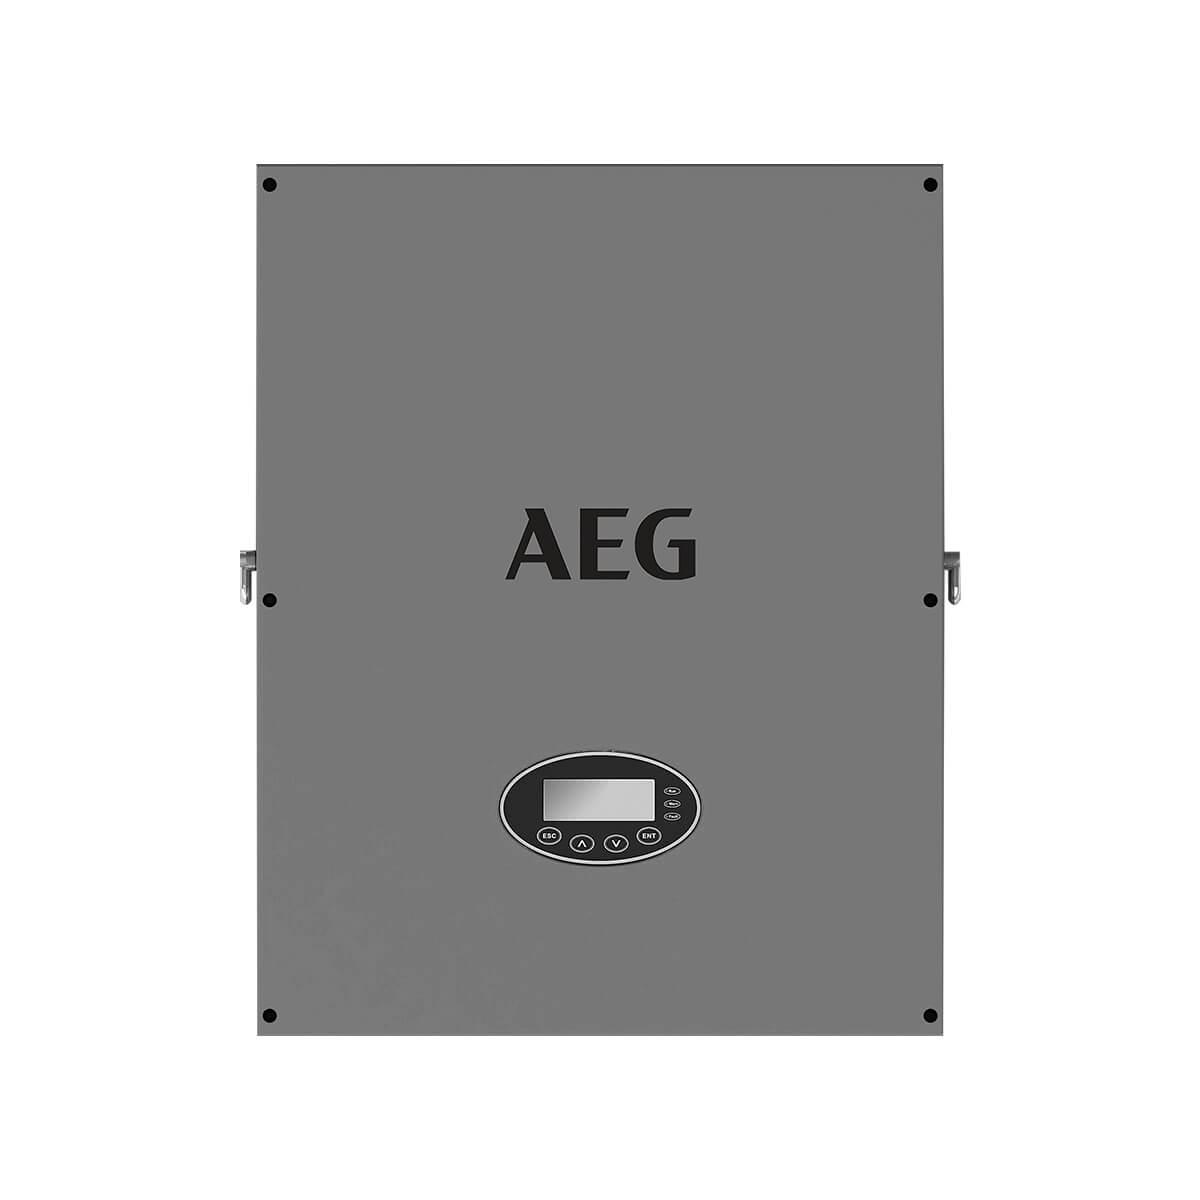 aeg 25kW inverter, aeg as-ic01 25kW inverter, aeg as-ic01-25000-2 inverter, aeg as-ic01-25000-2, aeg as-ic01 25kW